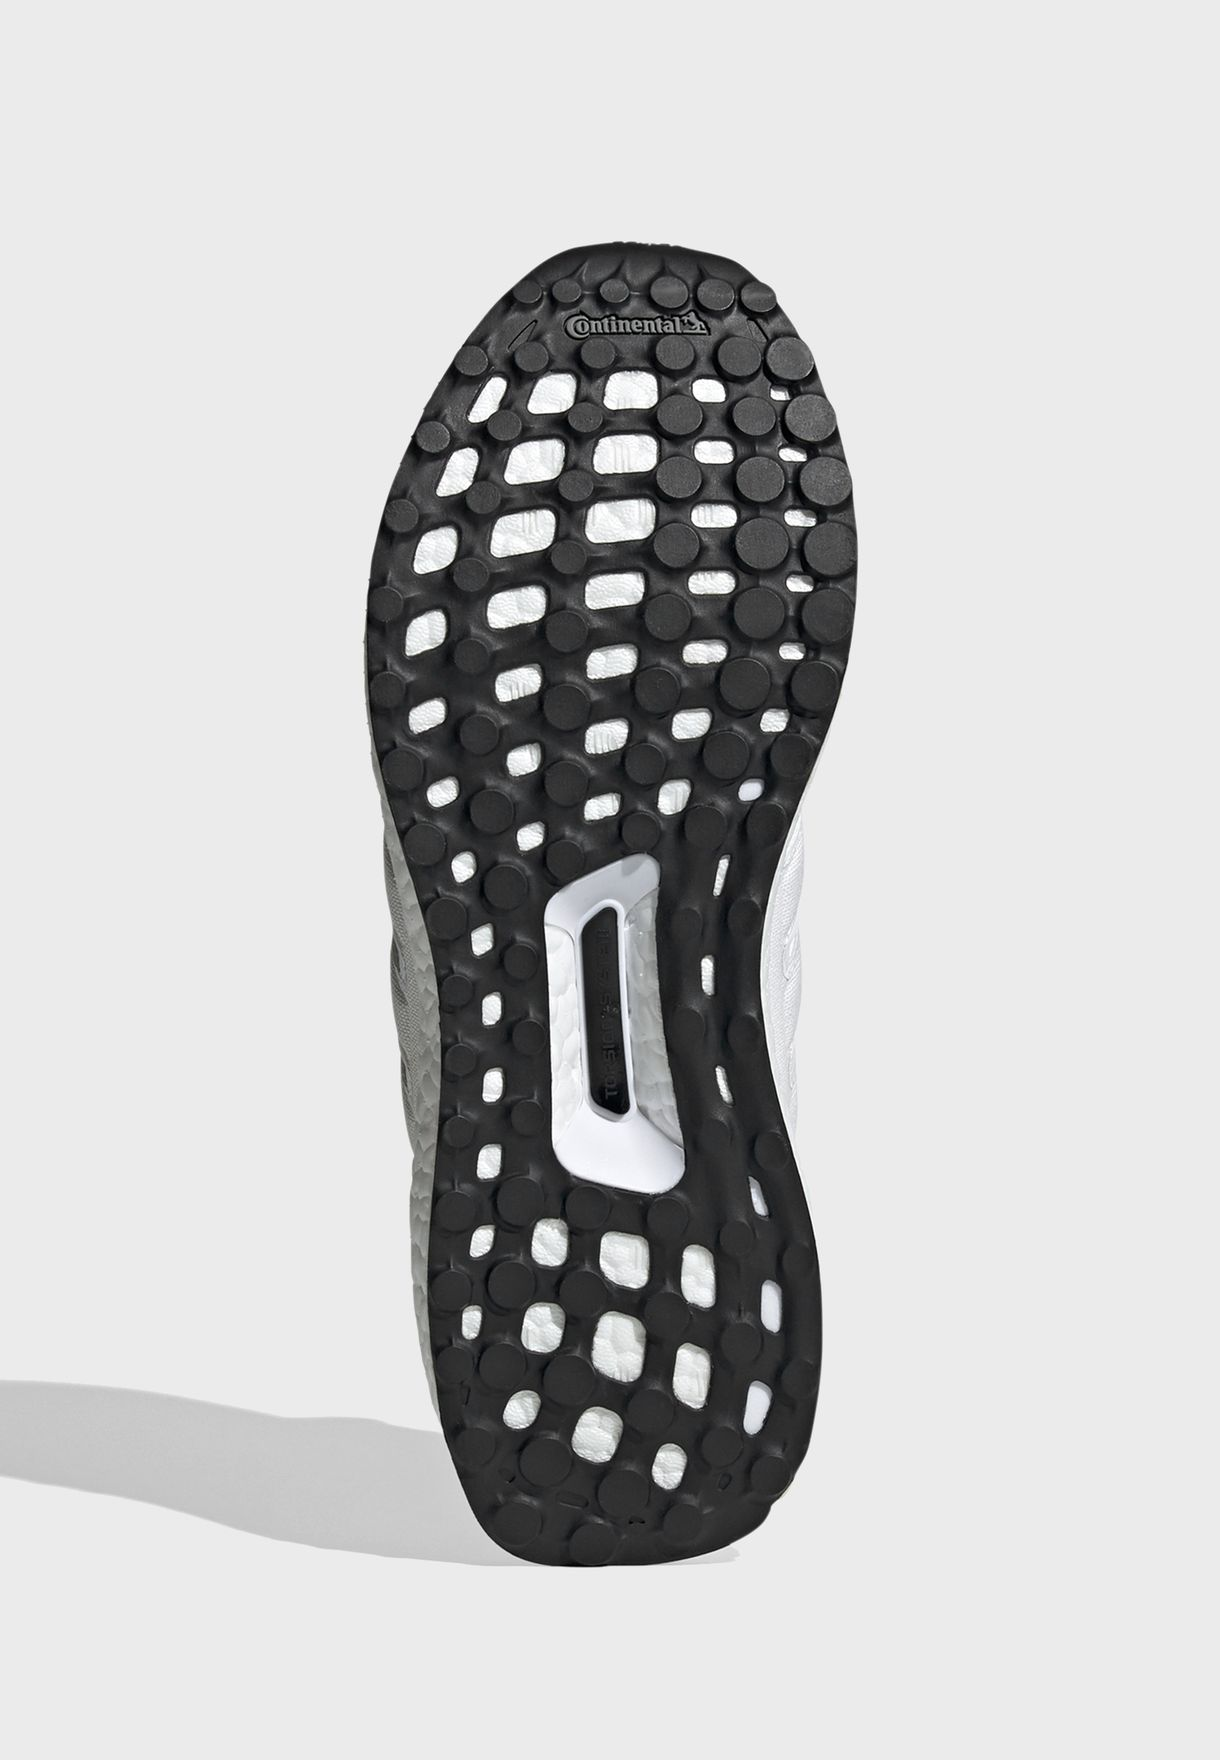 حذاء الترا بوست 5.0 دي ان اي